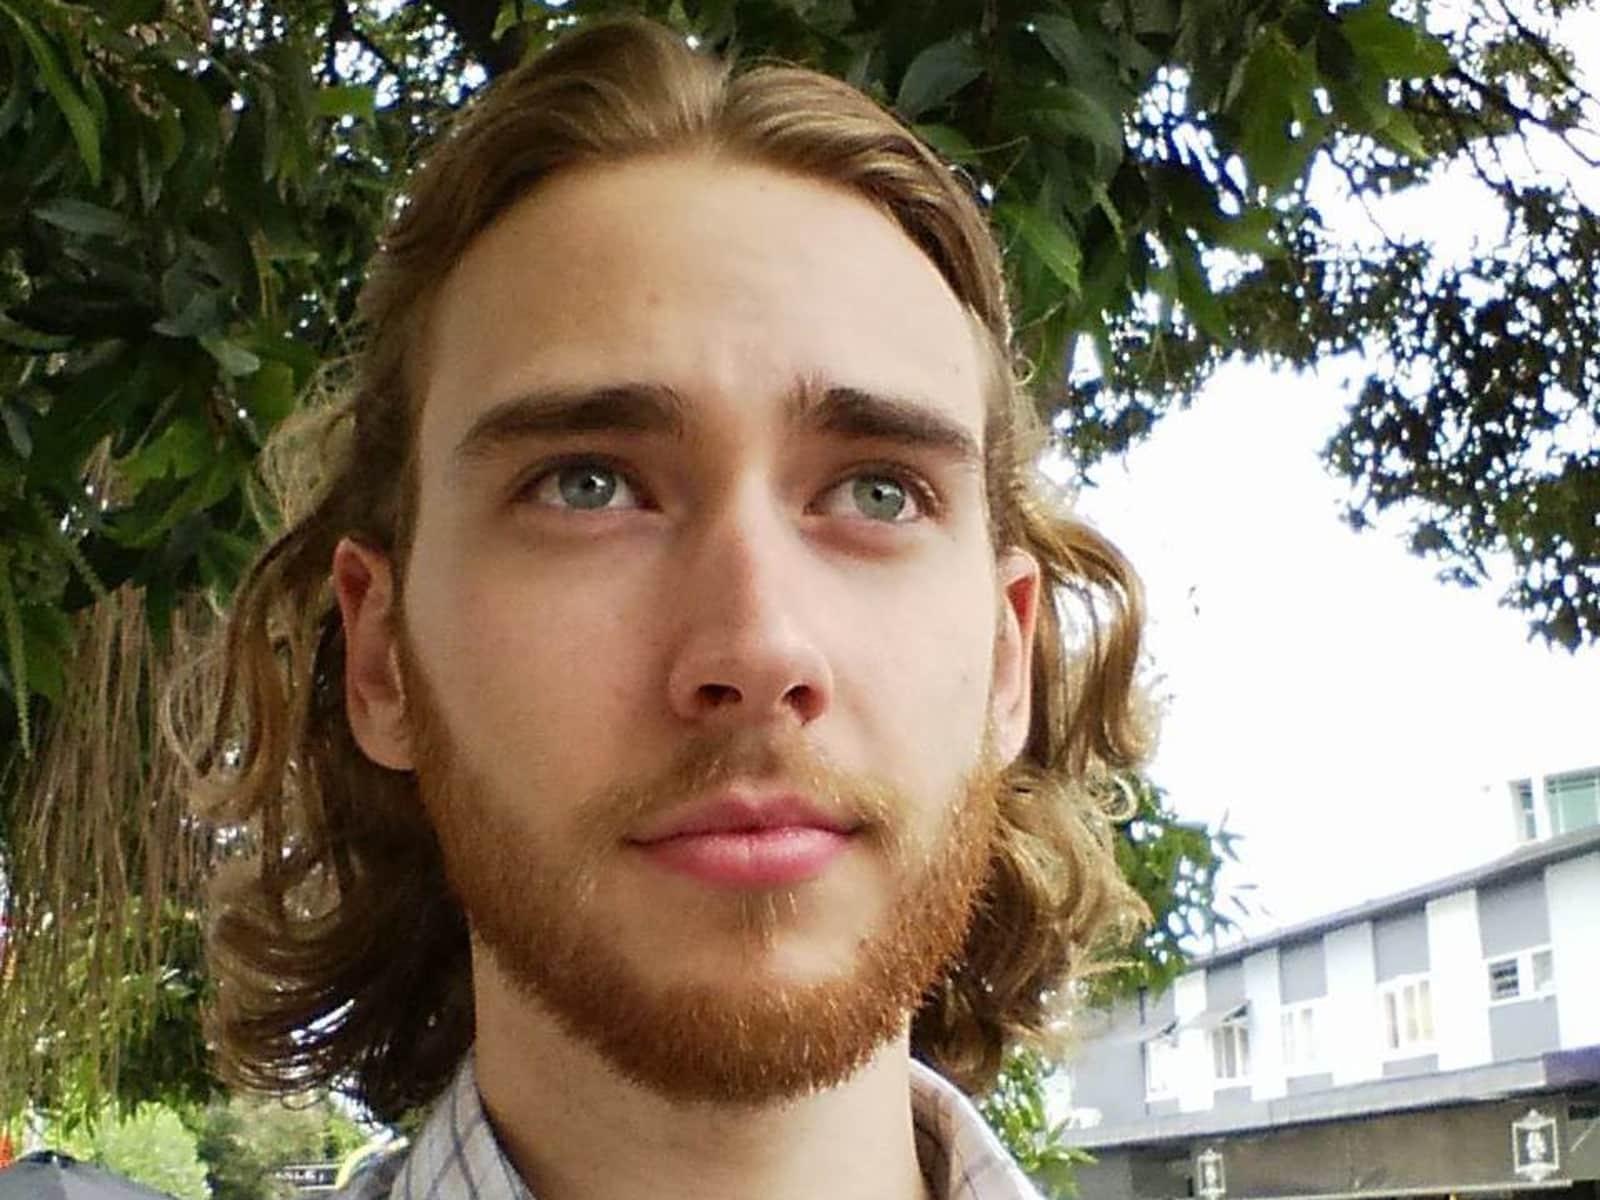 Robert from Brisbane, Queensland, Australia